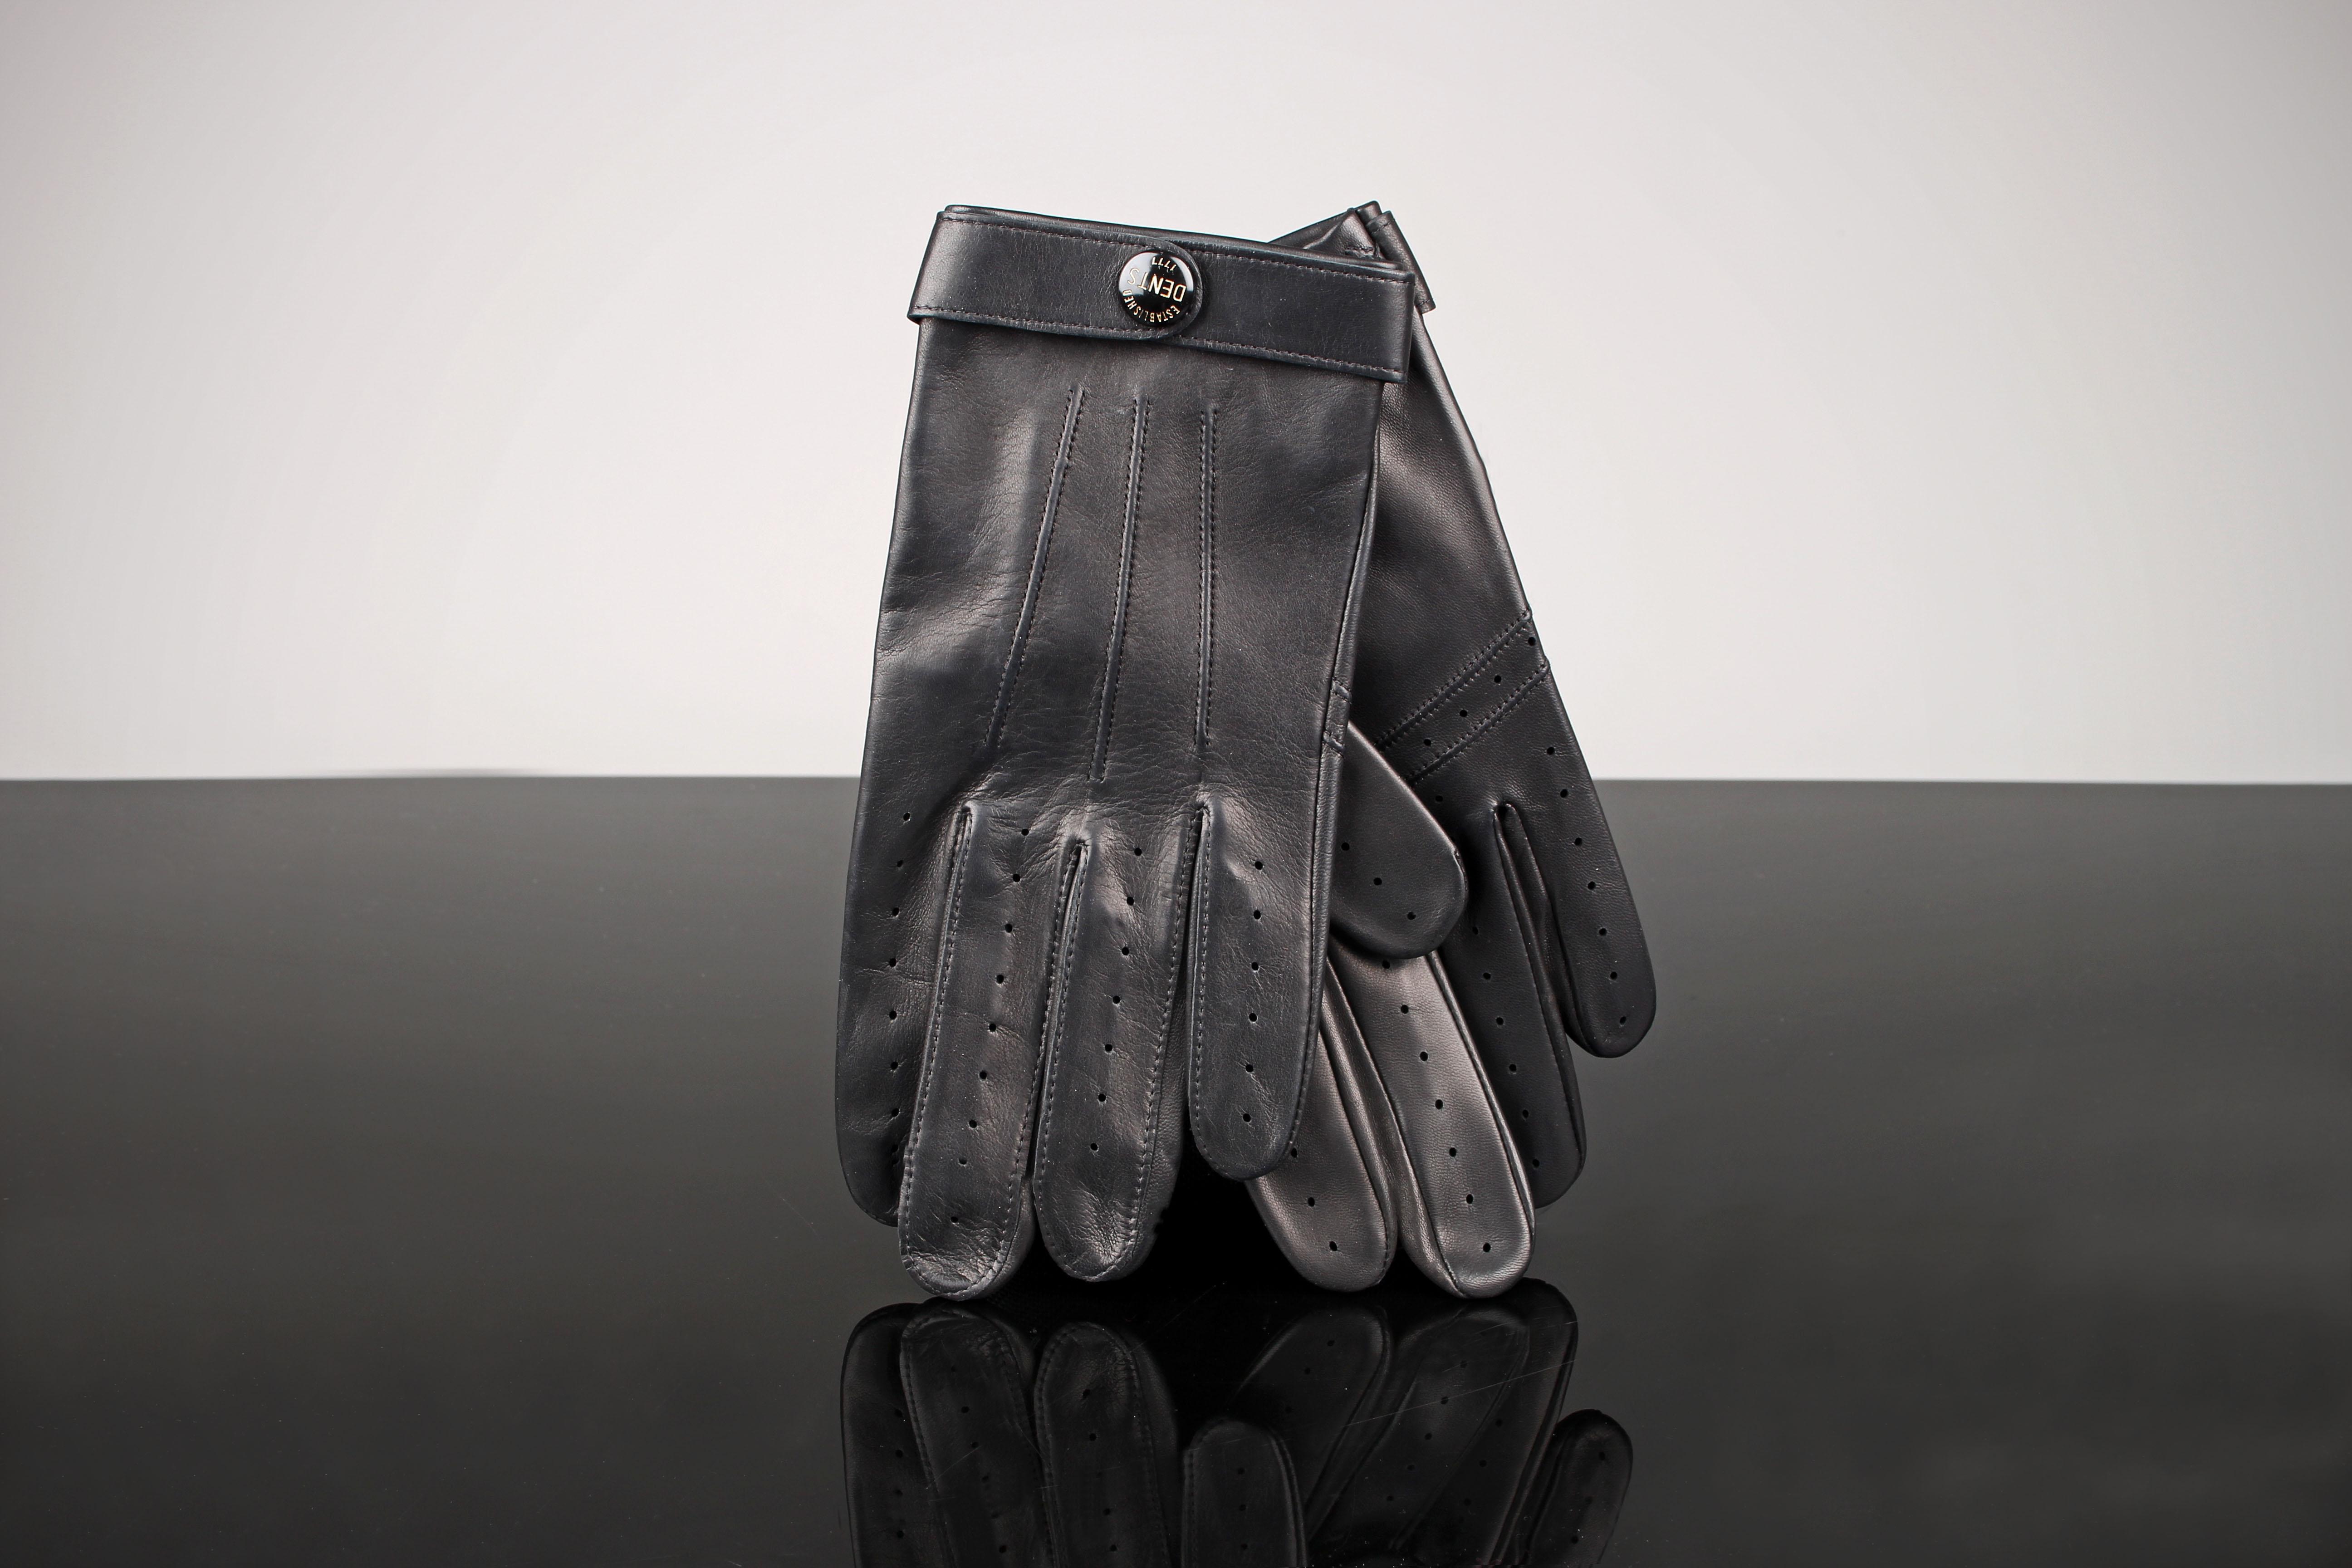 James bond leather driving gloves - Dents James Bond Spectre Leather Gloves 15 1007